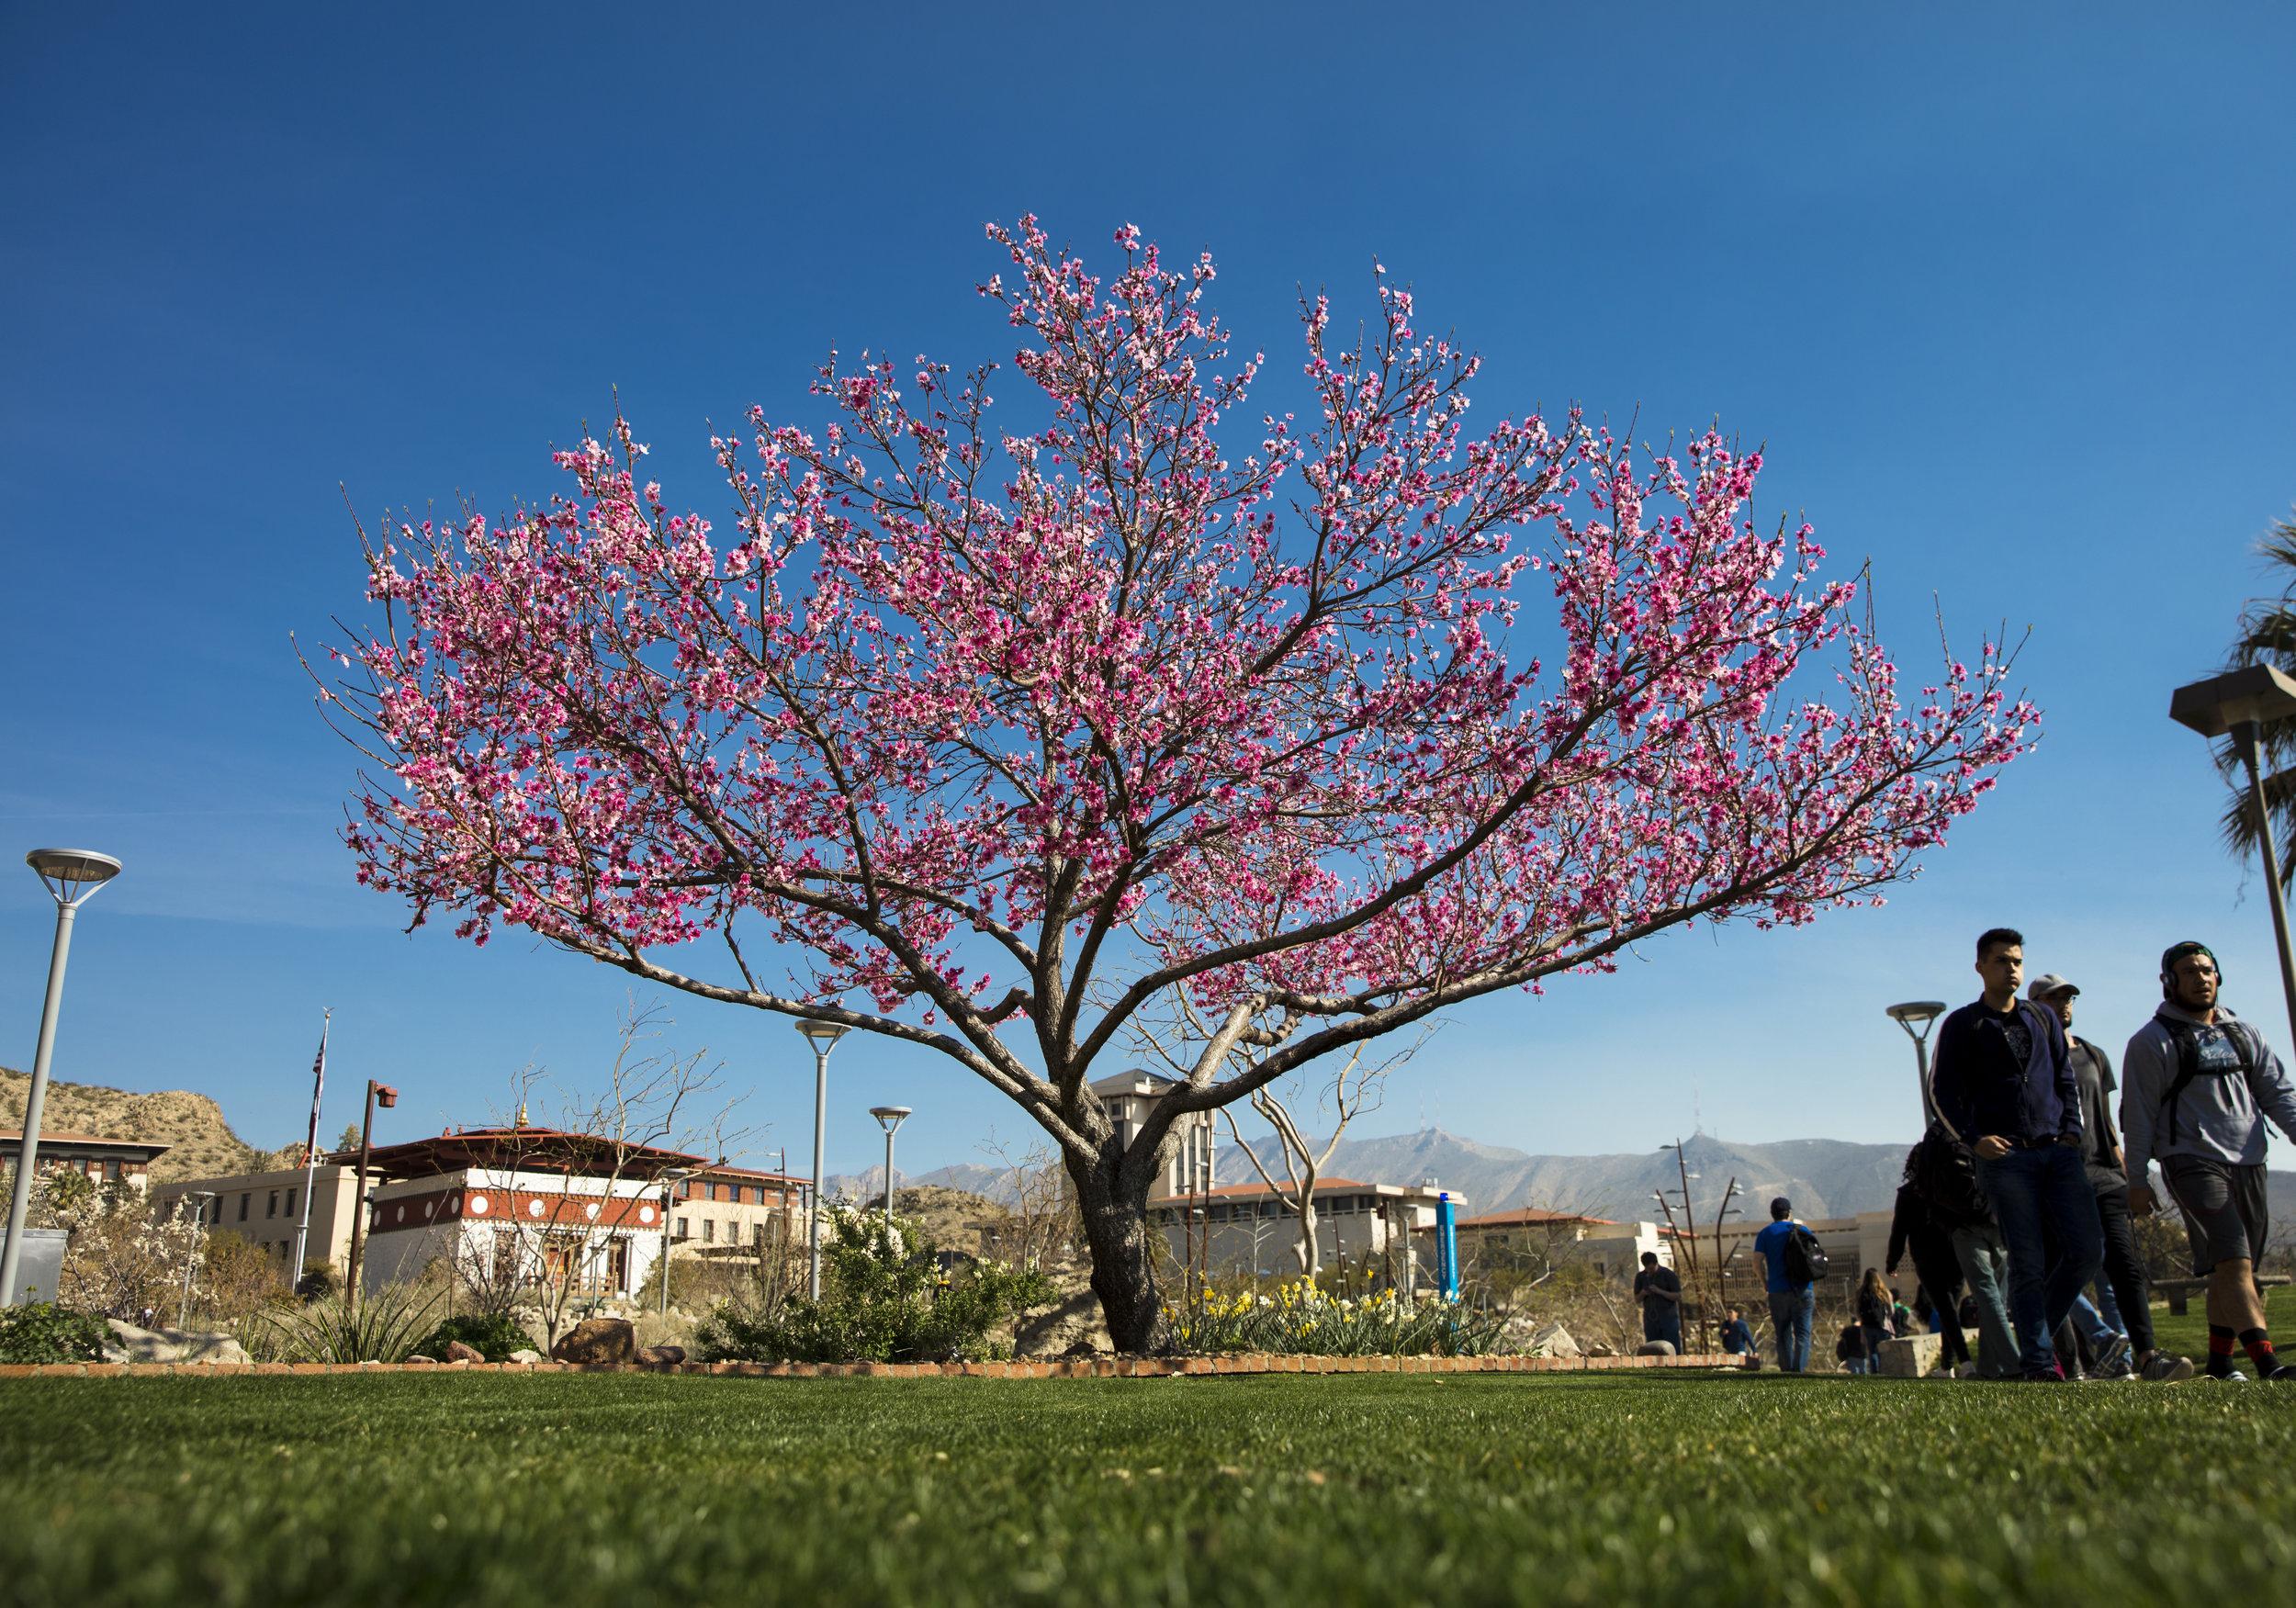 03_08_17 UTEP Campus New Spring Foliage IPA 01.JPG